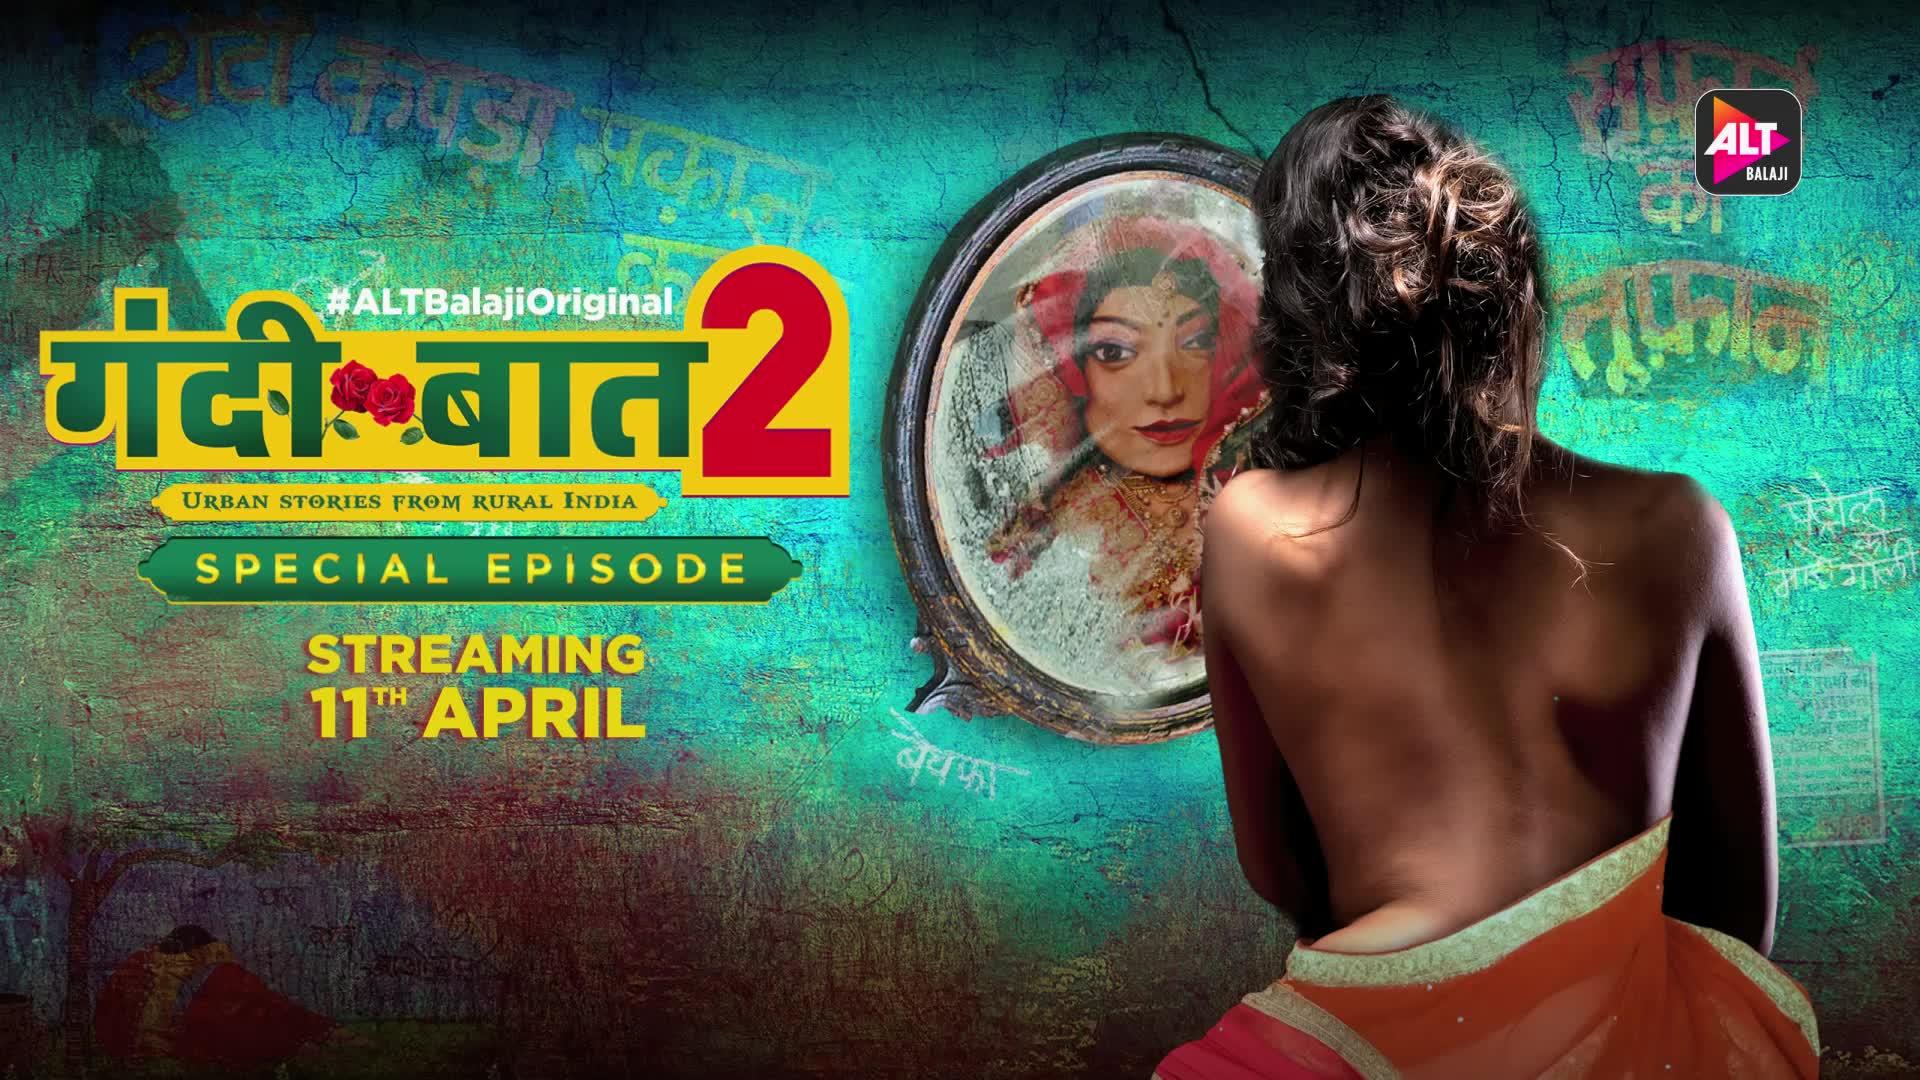 ALTBalaji | Gandii Baat - Season 2 | Special Episode Trailer